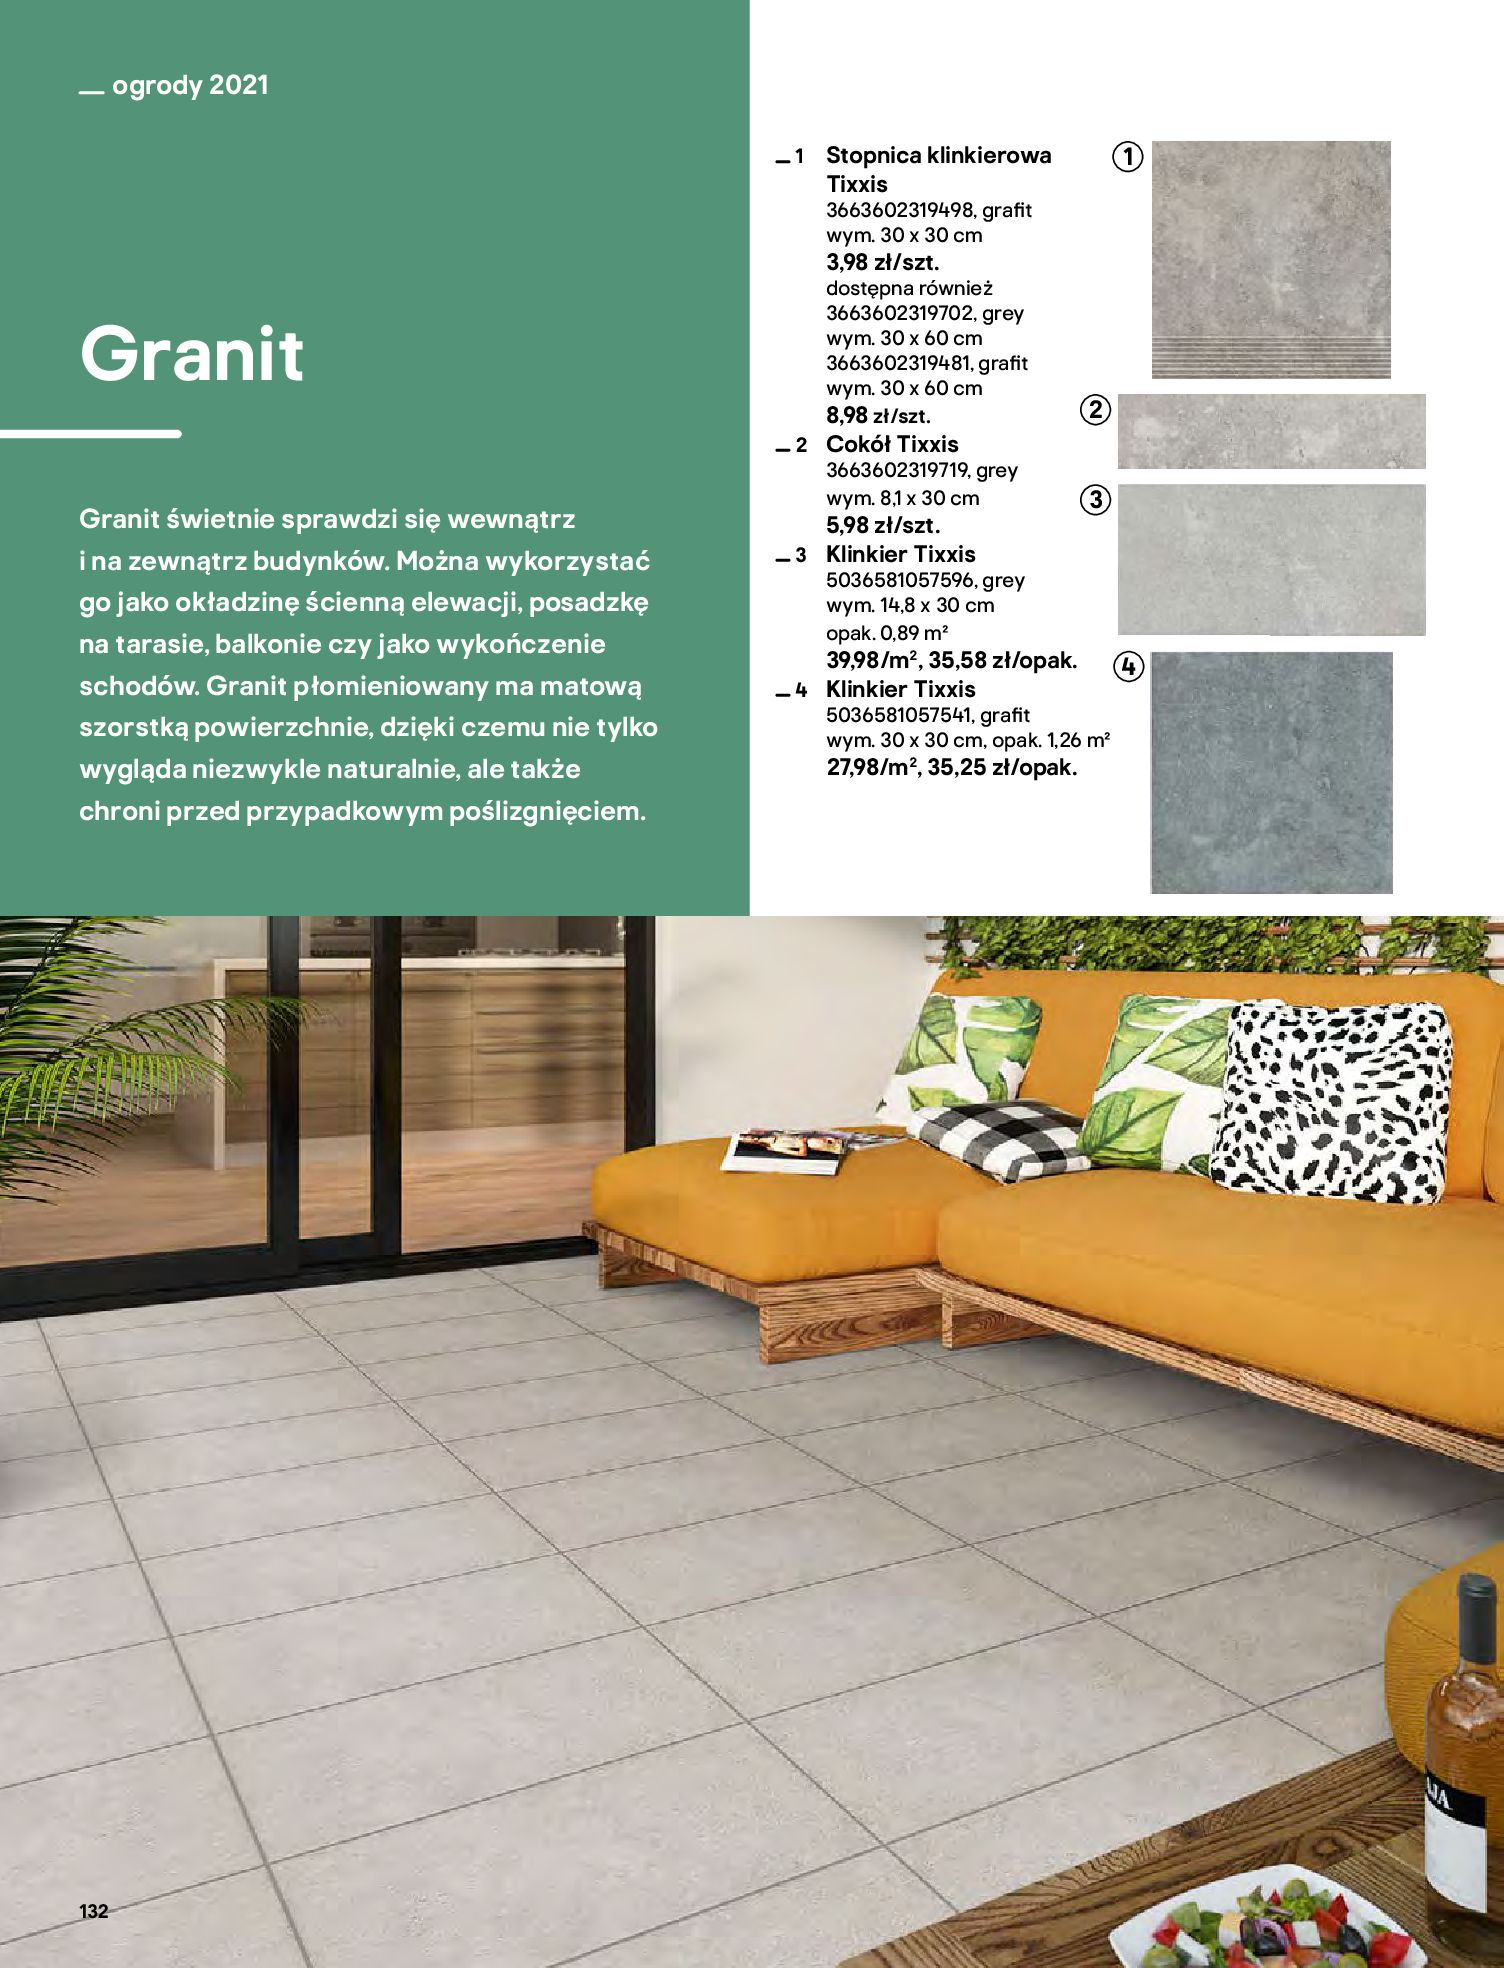 Gazetka Castorama: Katalog ogrody 2021-03-01 page-132